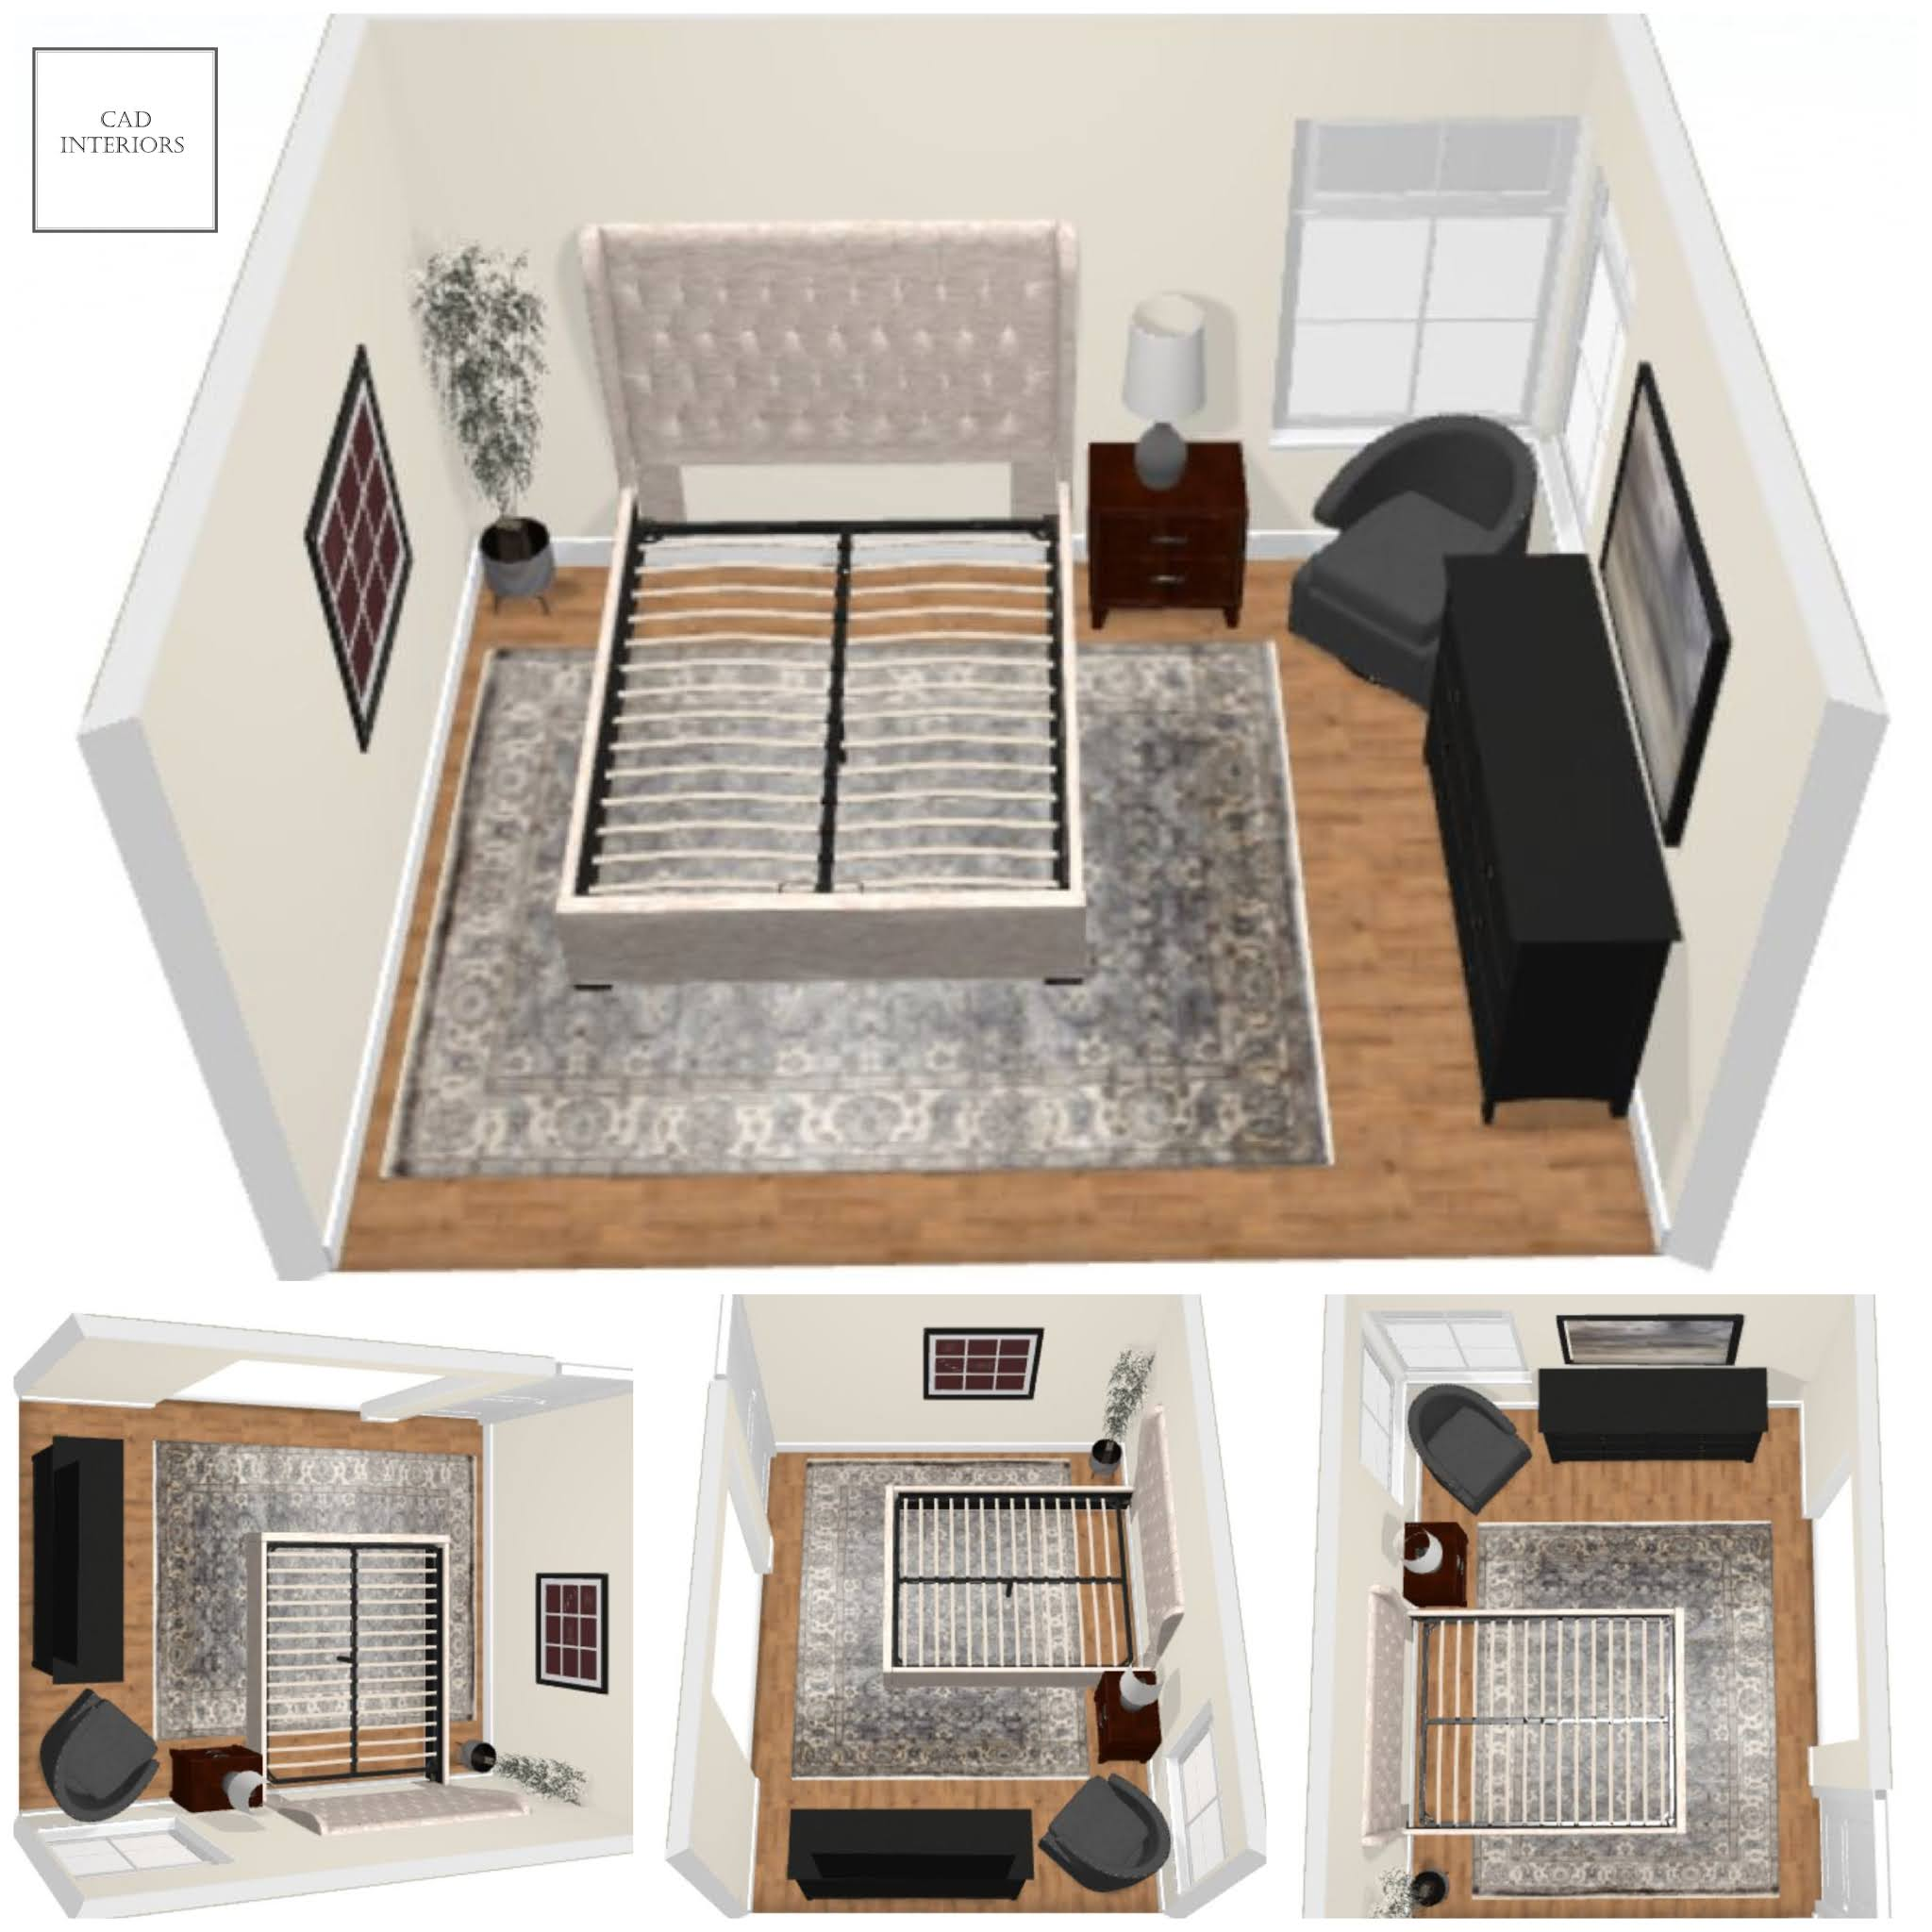 CAD Interiors professional online interior e-design primary master bedroom design